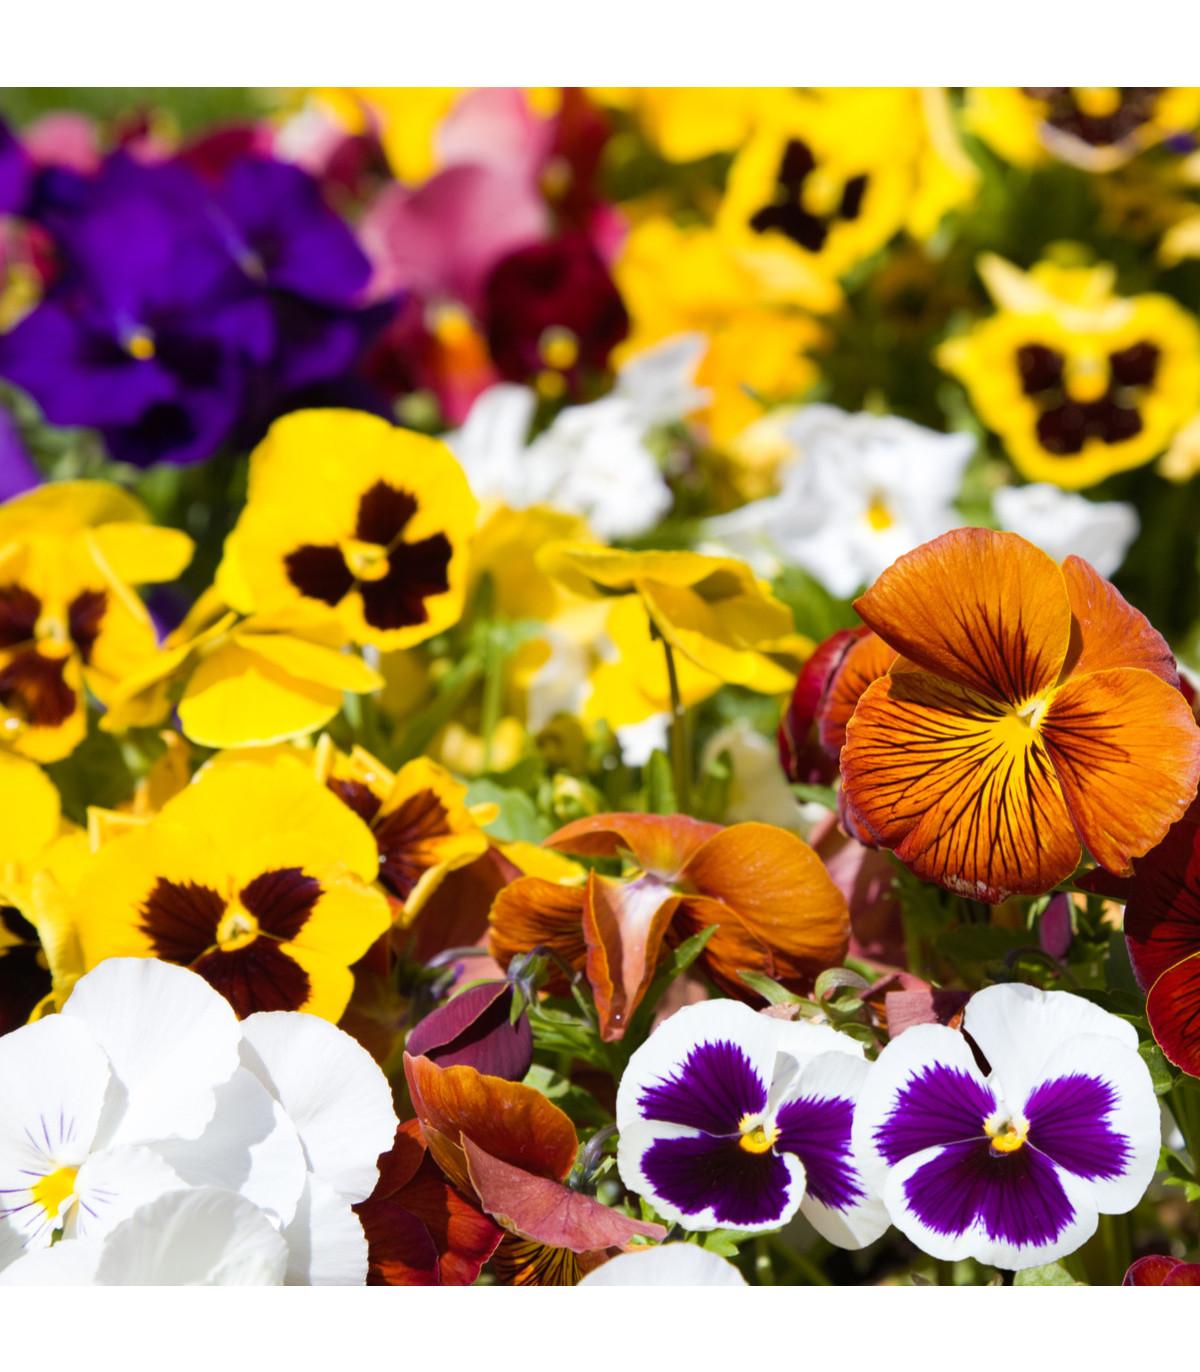 Maceška Hiemalis směs barev - Viola wittrockiana - semena - 200 ks